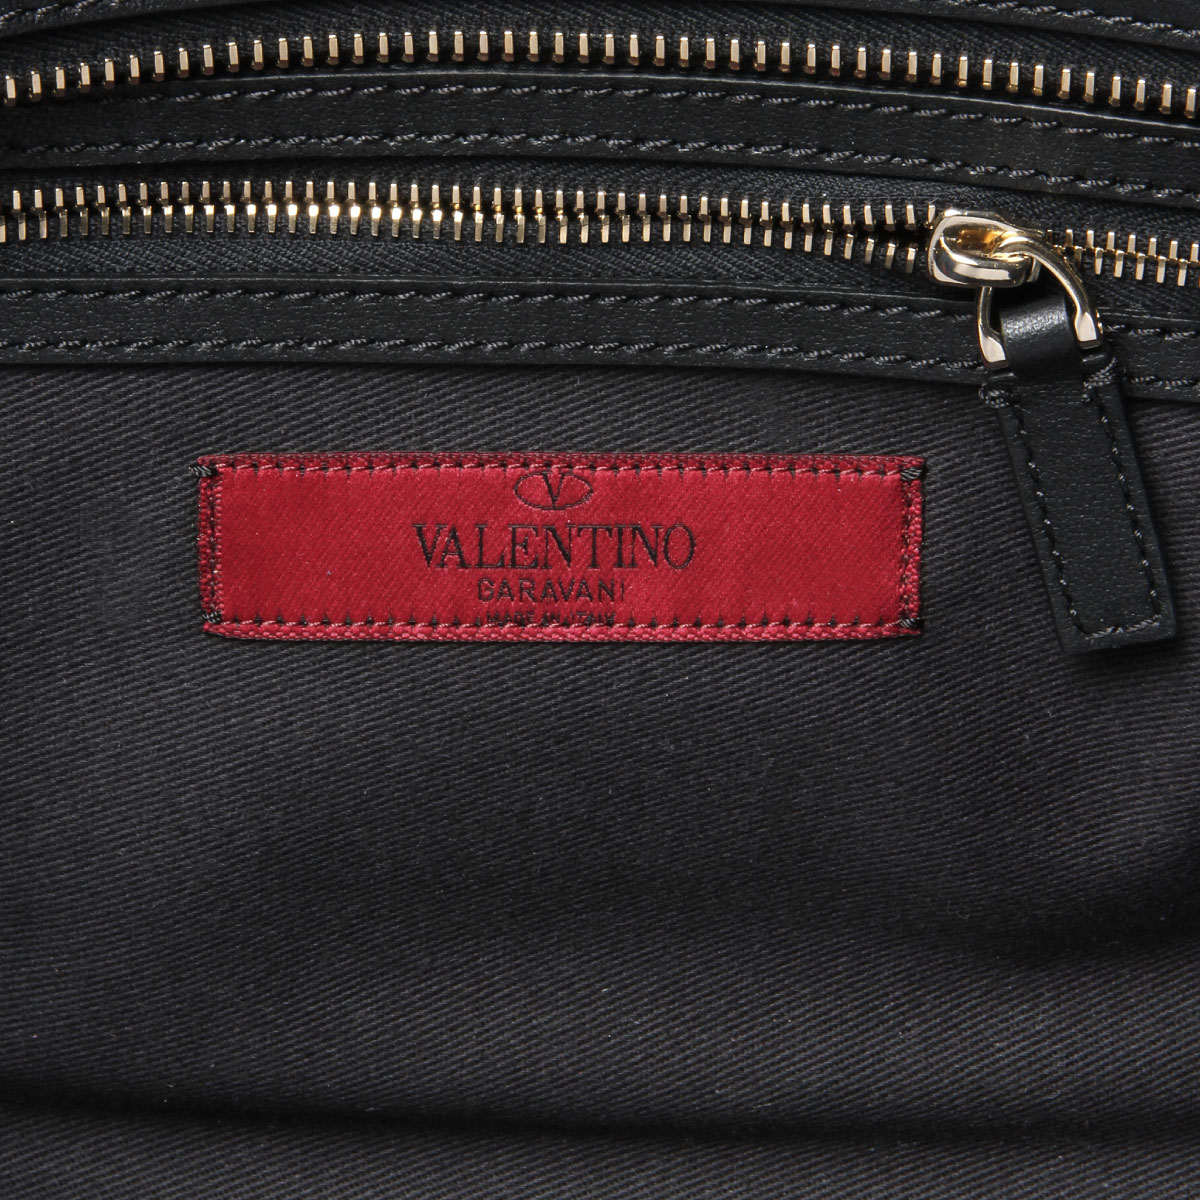 importshopdouble: 華倫天奴VALENTINO包女士QW2B0540BOL 0NO肩膀在的手提包小ROCKSTUD液體氧塔德NERO黑色   日本樂天市場